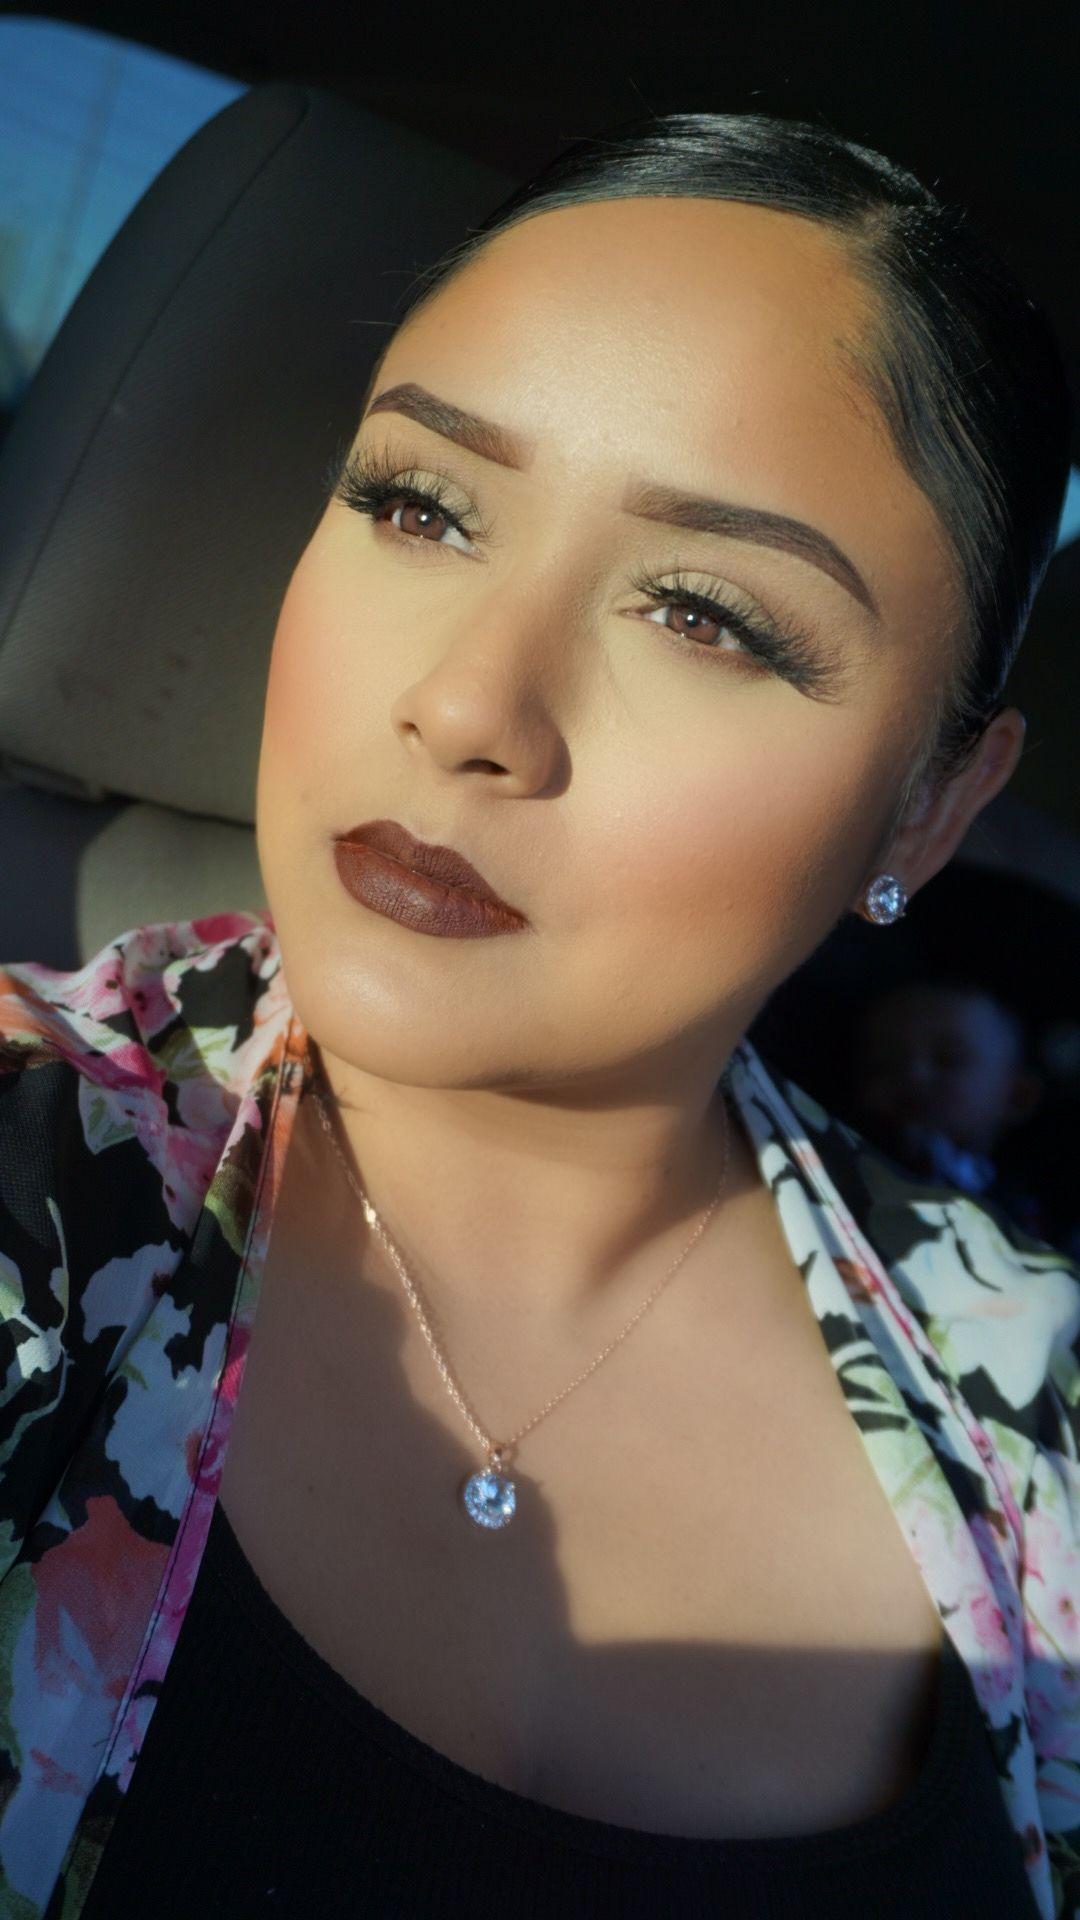 bronzemakeup bronzer makeup fashion makeuplooks